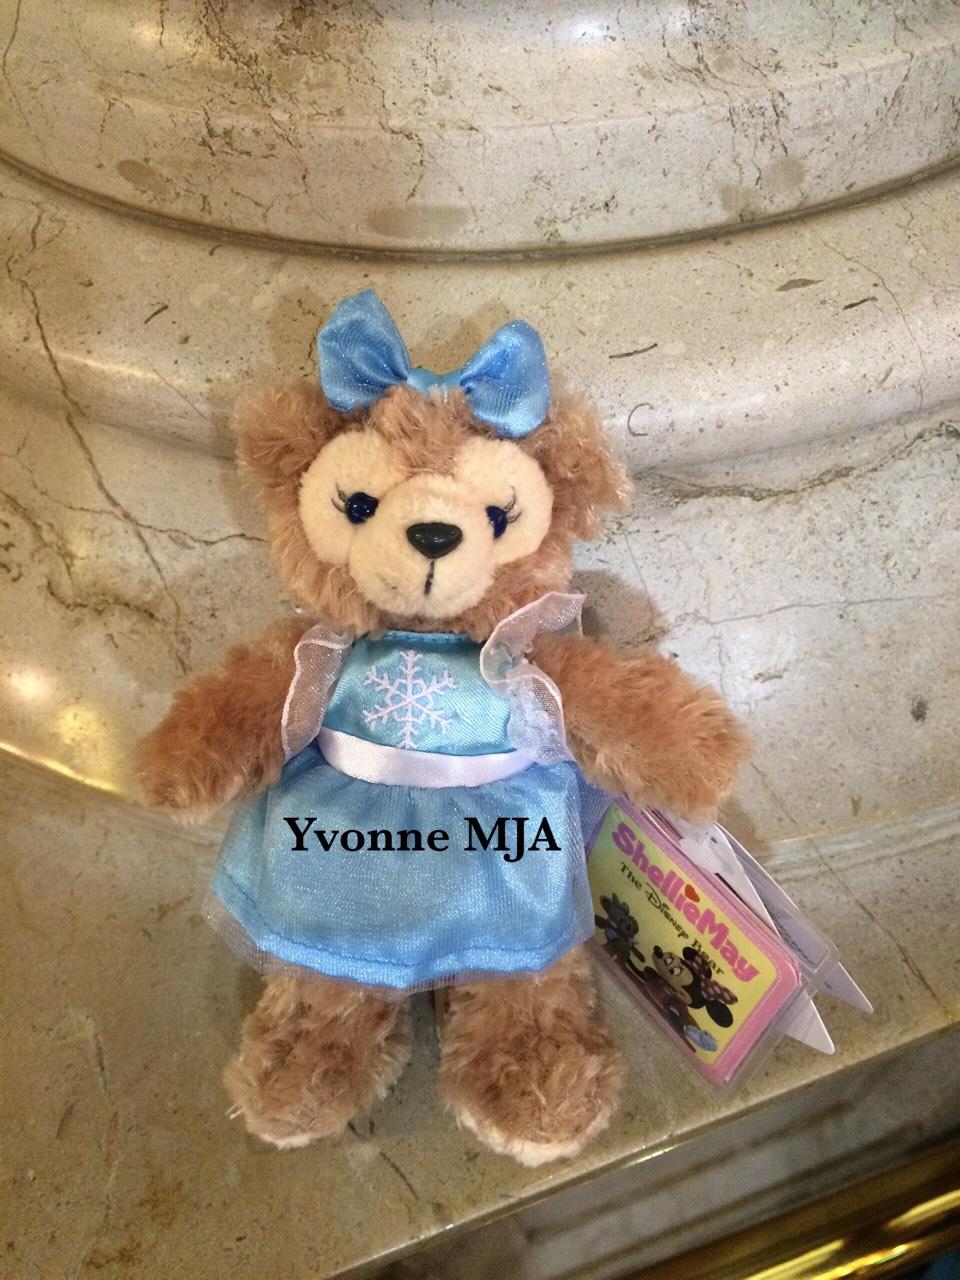 *Yvonne MJA香港代購*香港迪士尼限定正品 Duffy達菲熊冰雪奇緣愛Elsa外衣版吊飾